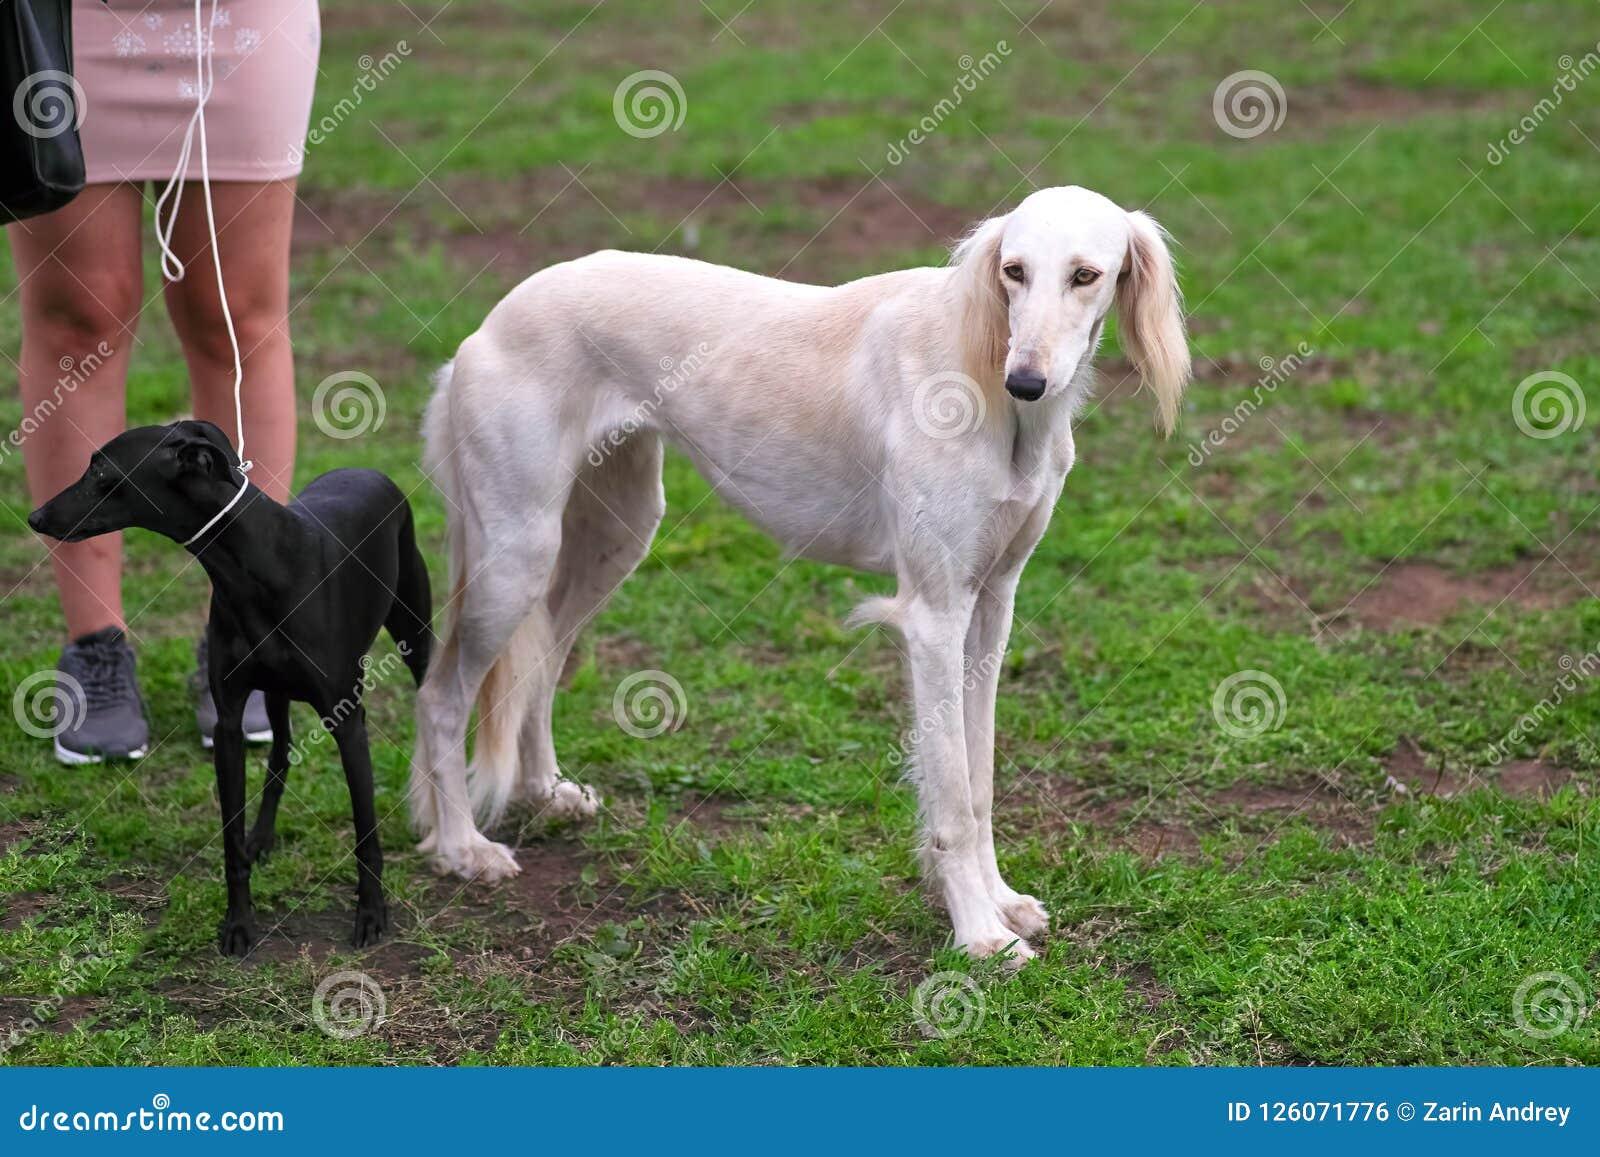 Saluki Persian Greyhound Medium Sized Hunting Dog Close Up Stock Photo Image Of Pointer Male 126071776